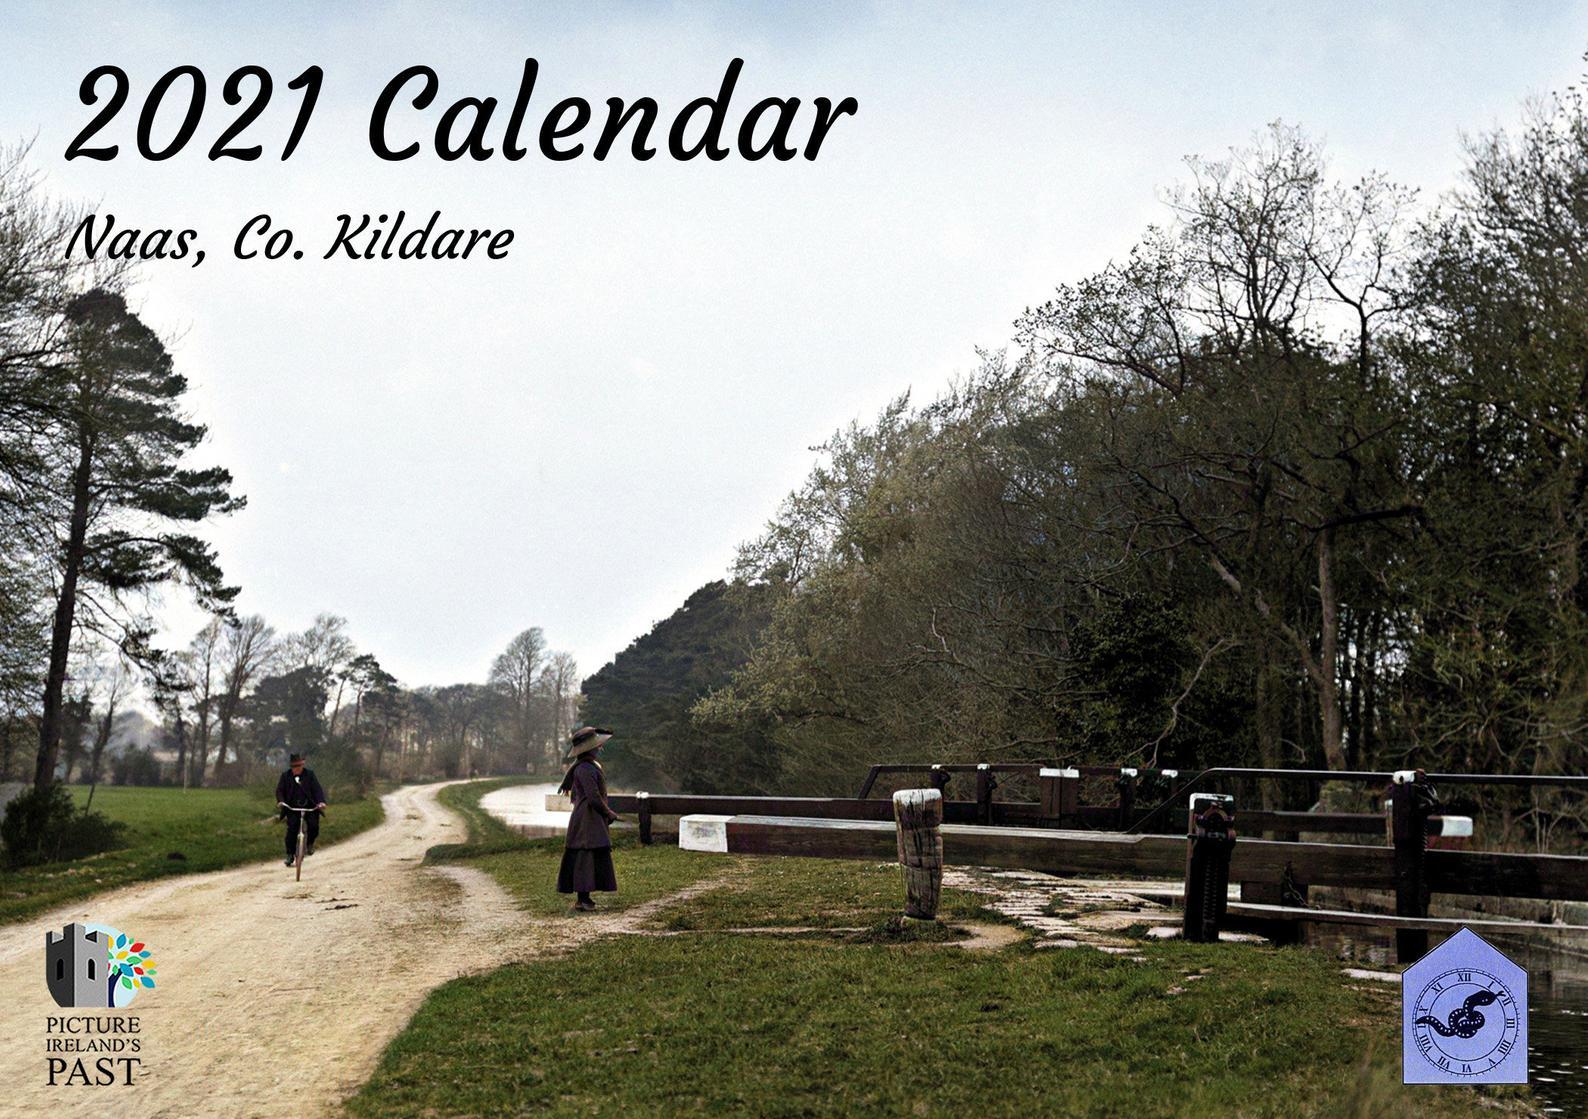 2021 Naas desk calendar Image